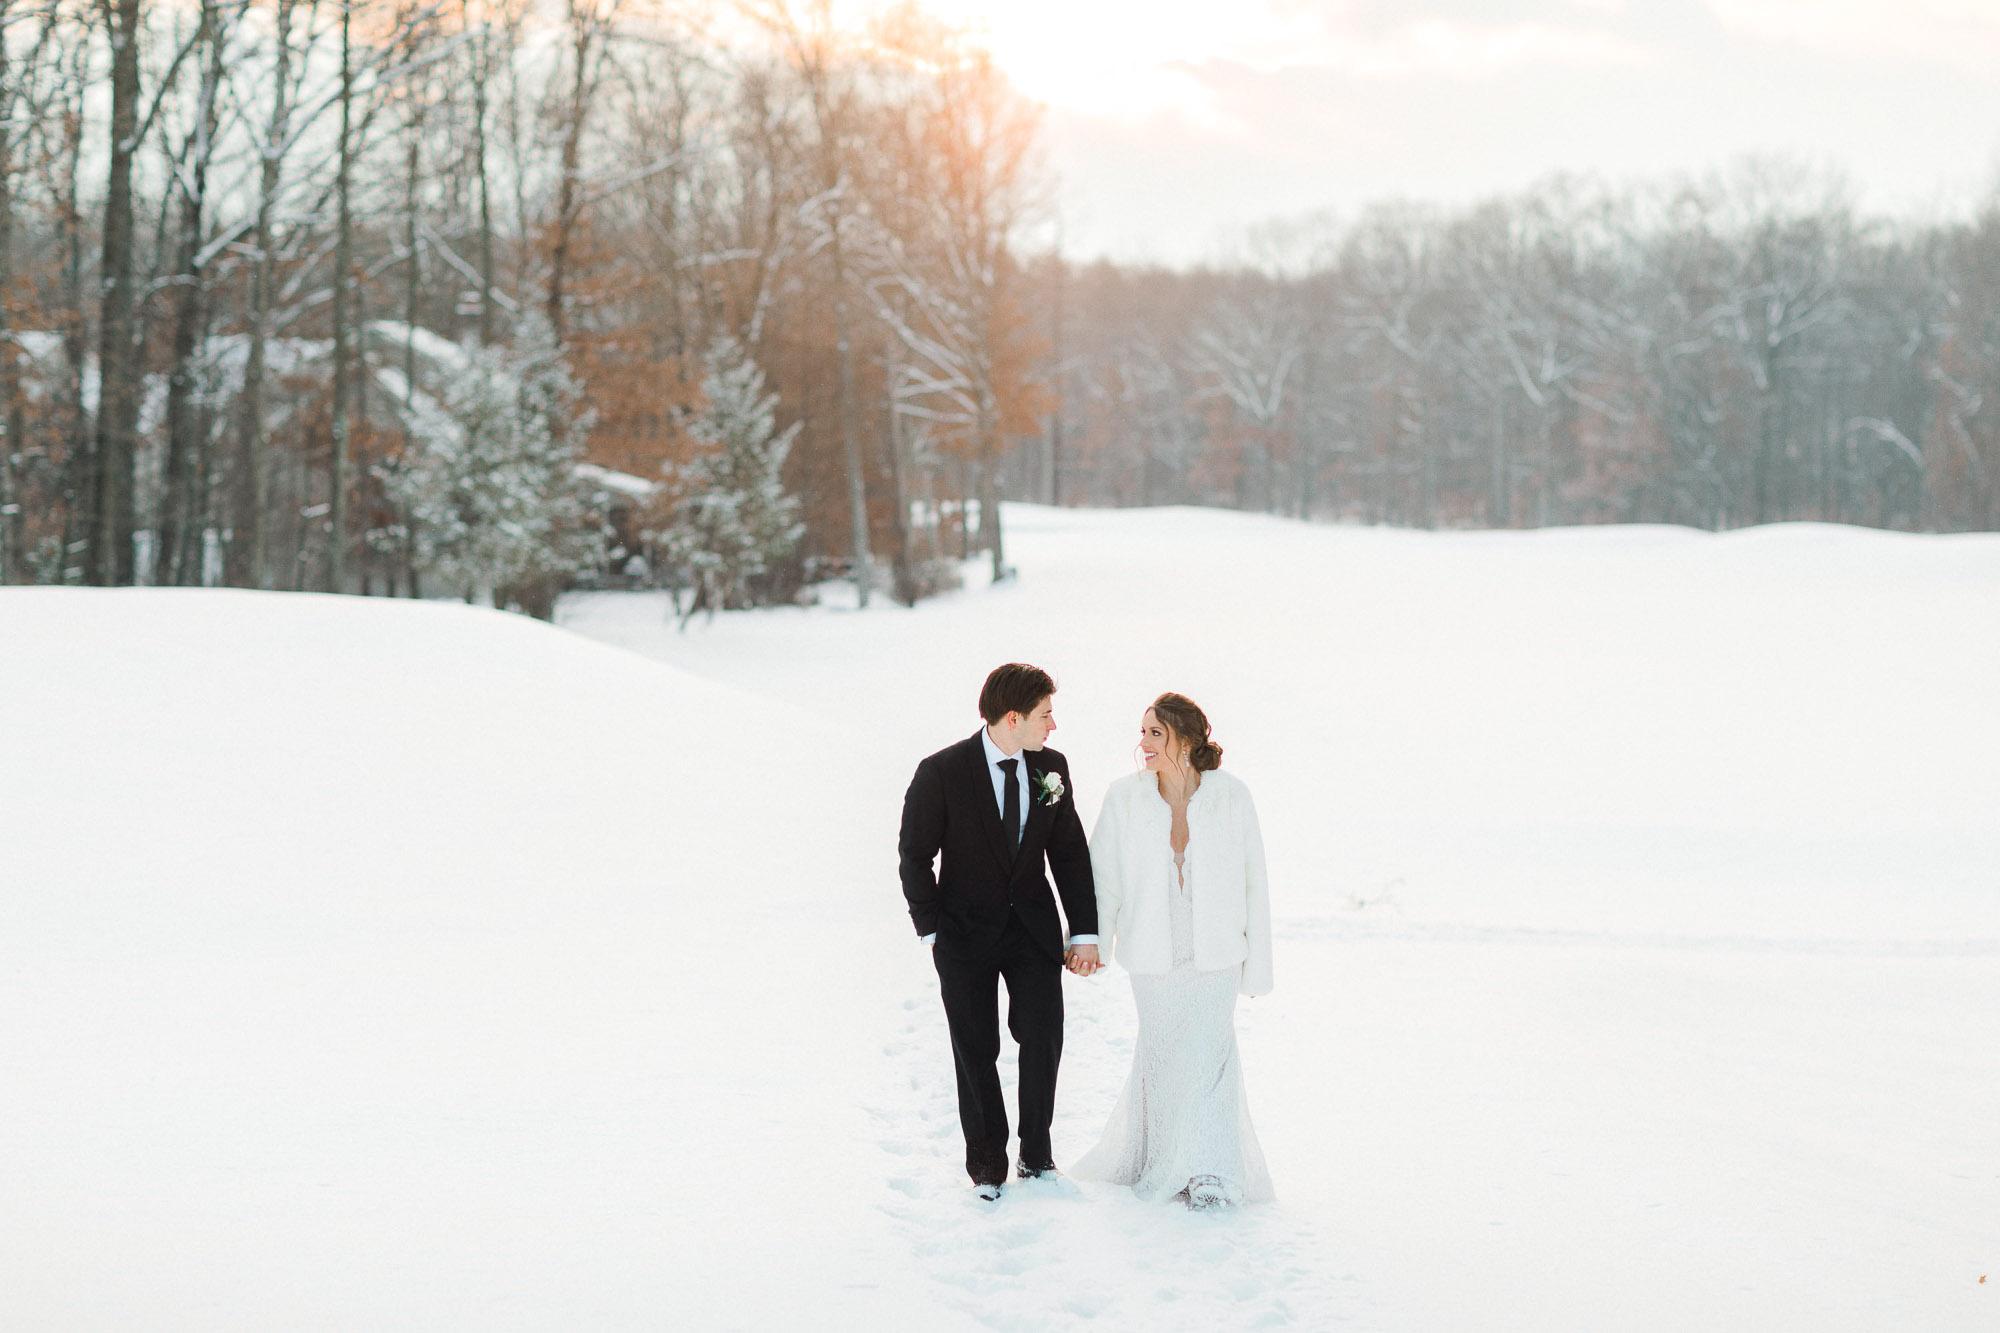 snowy-sand-springs-country-club-drums-pa-christmas-wedding-24898.jpg